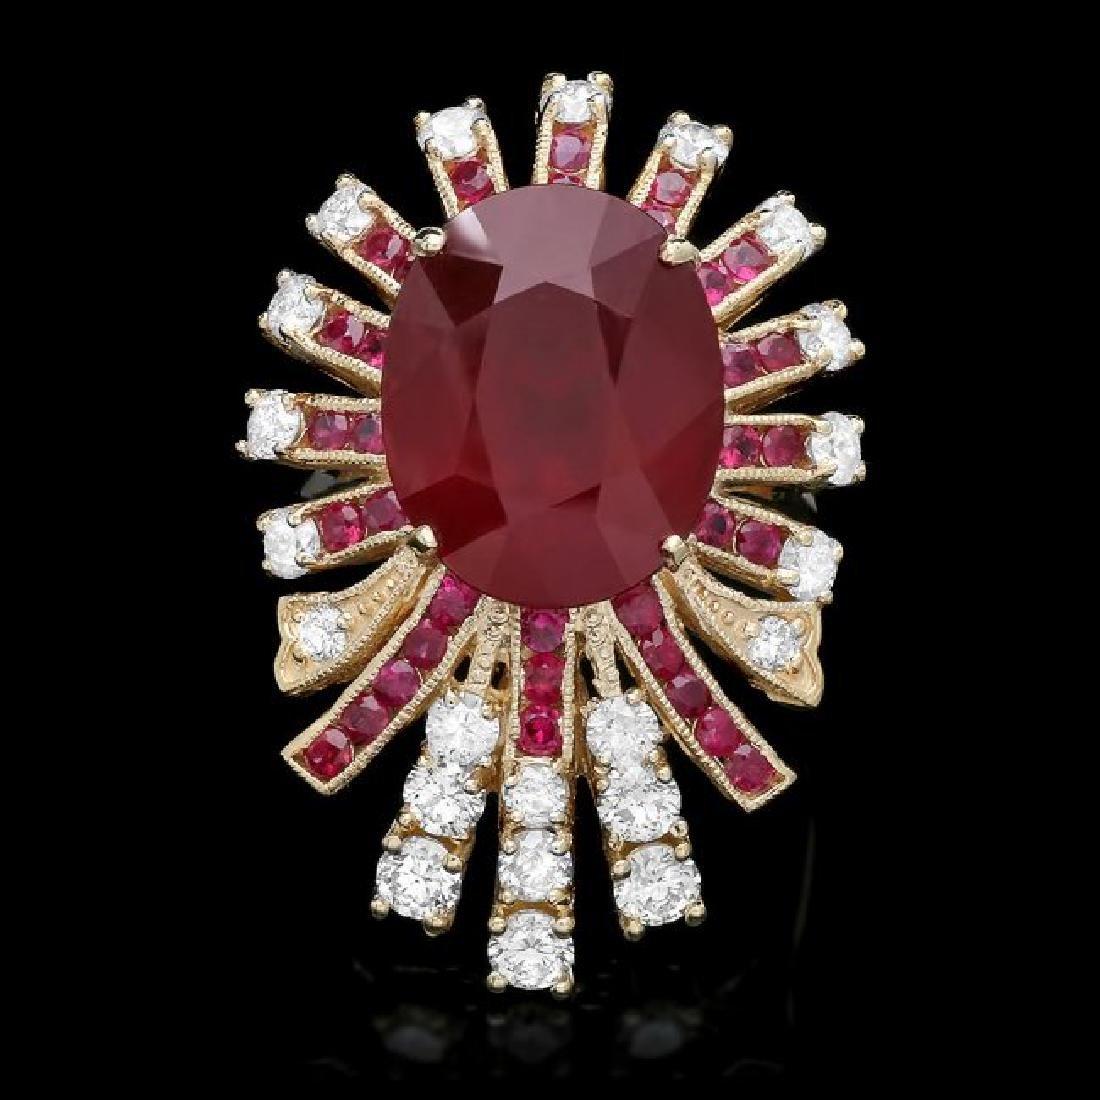 14k Yellow Gold 14ct Ruby 1.85ct Diamond Ring